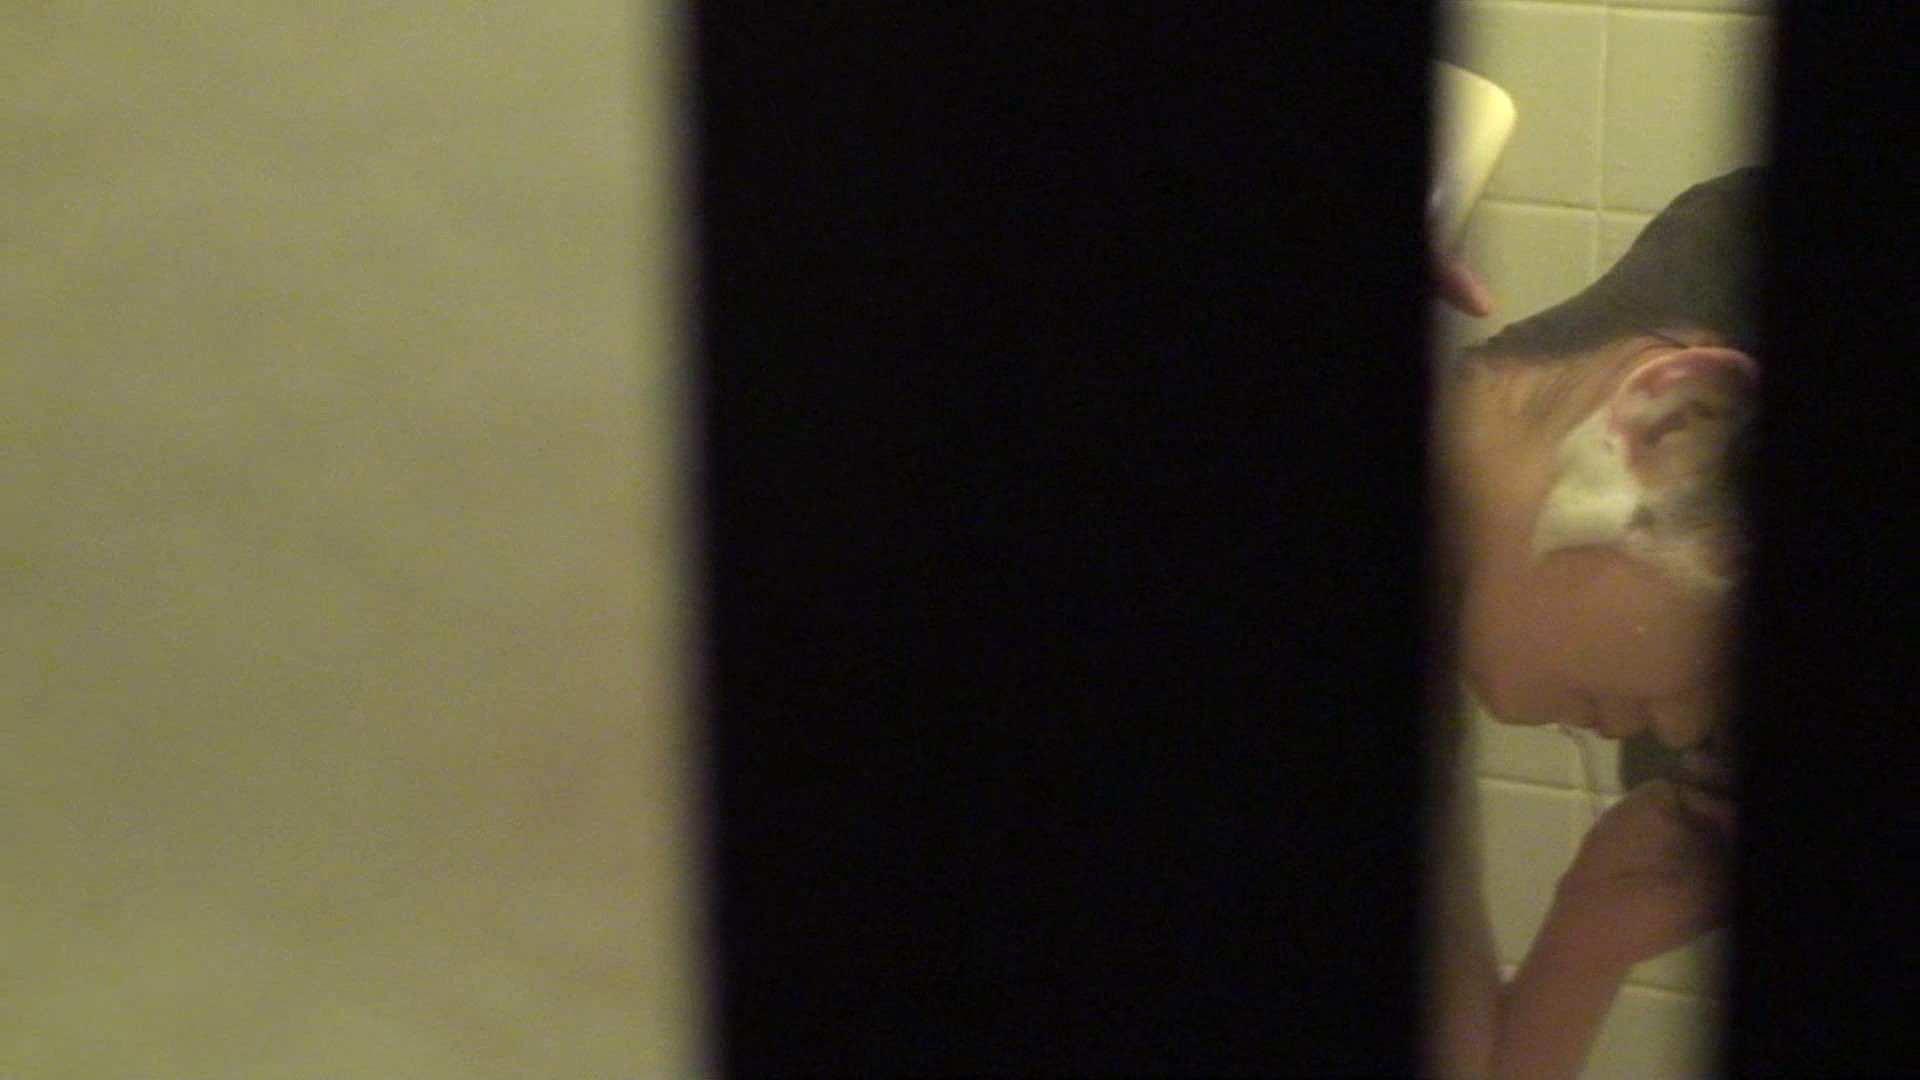 vol.02超可愛すぎる彼女の裸体をハイビジョンで!至近距離での眺め最高! 美人の裸体 AV無料動画キャプチャ 75枚 26